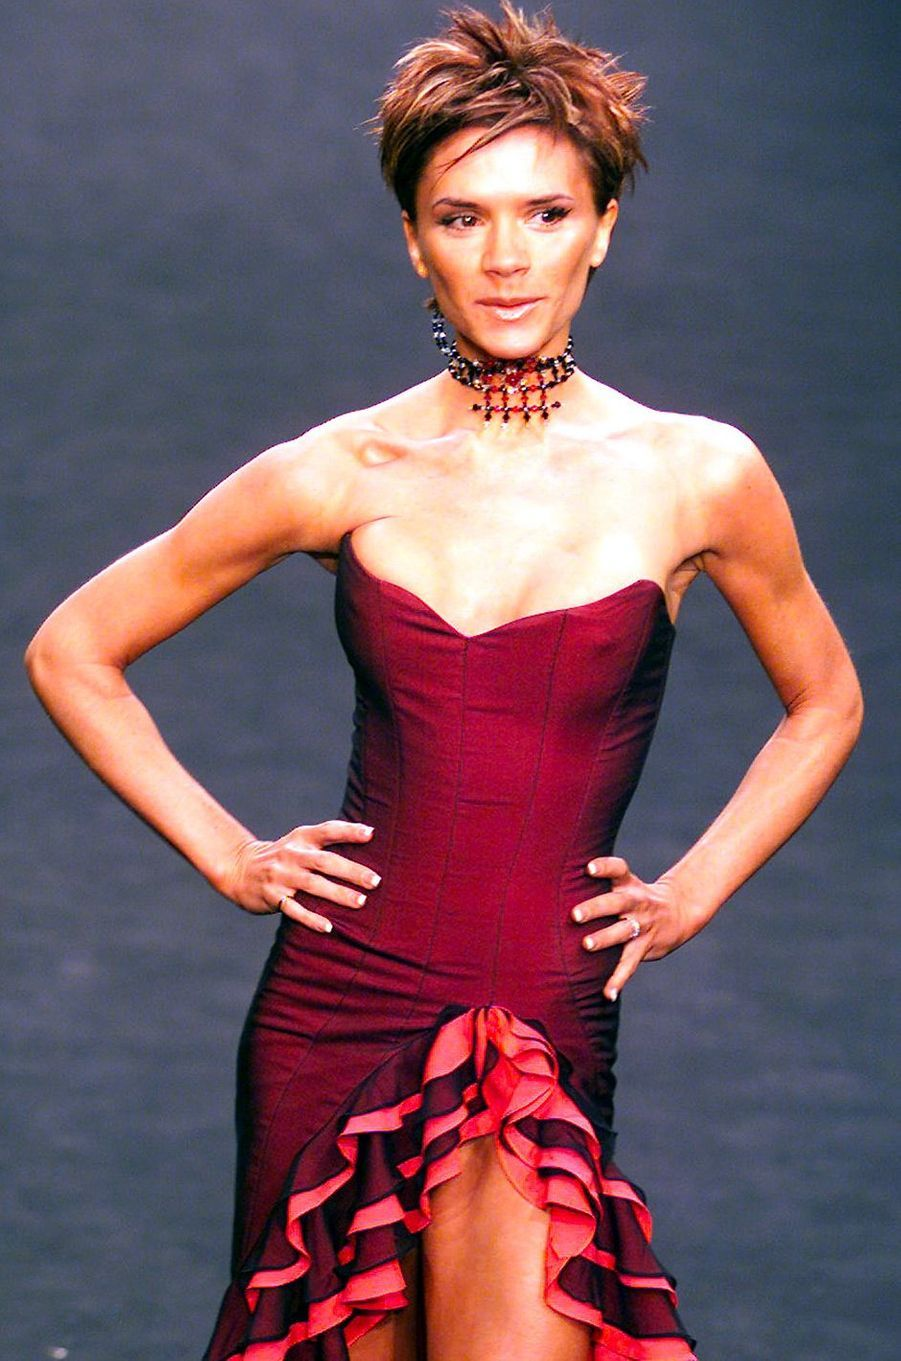 Victoria Beckham, aka Posh Spice, le 16 février 2000